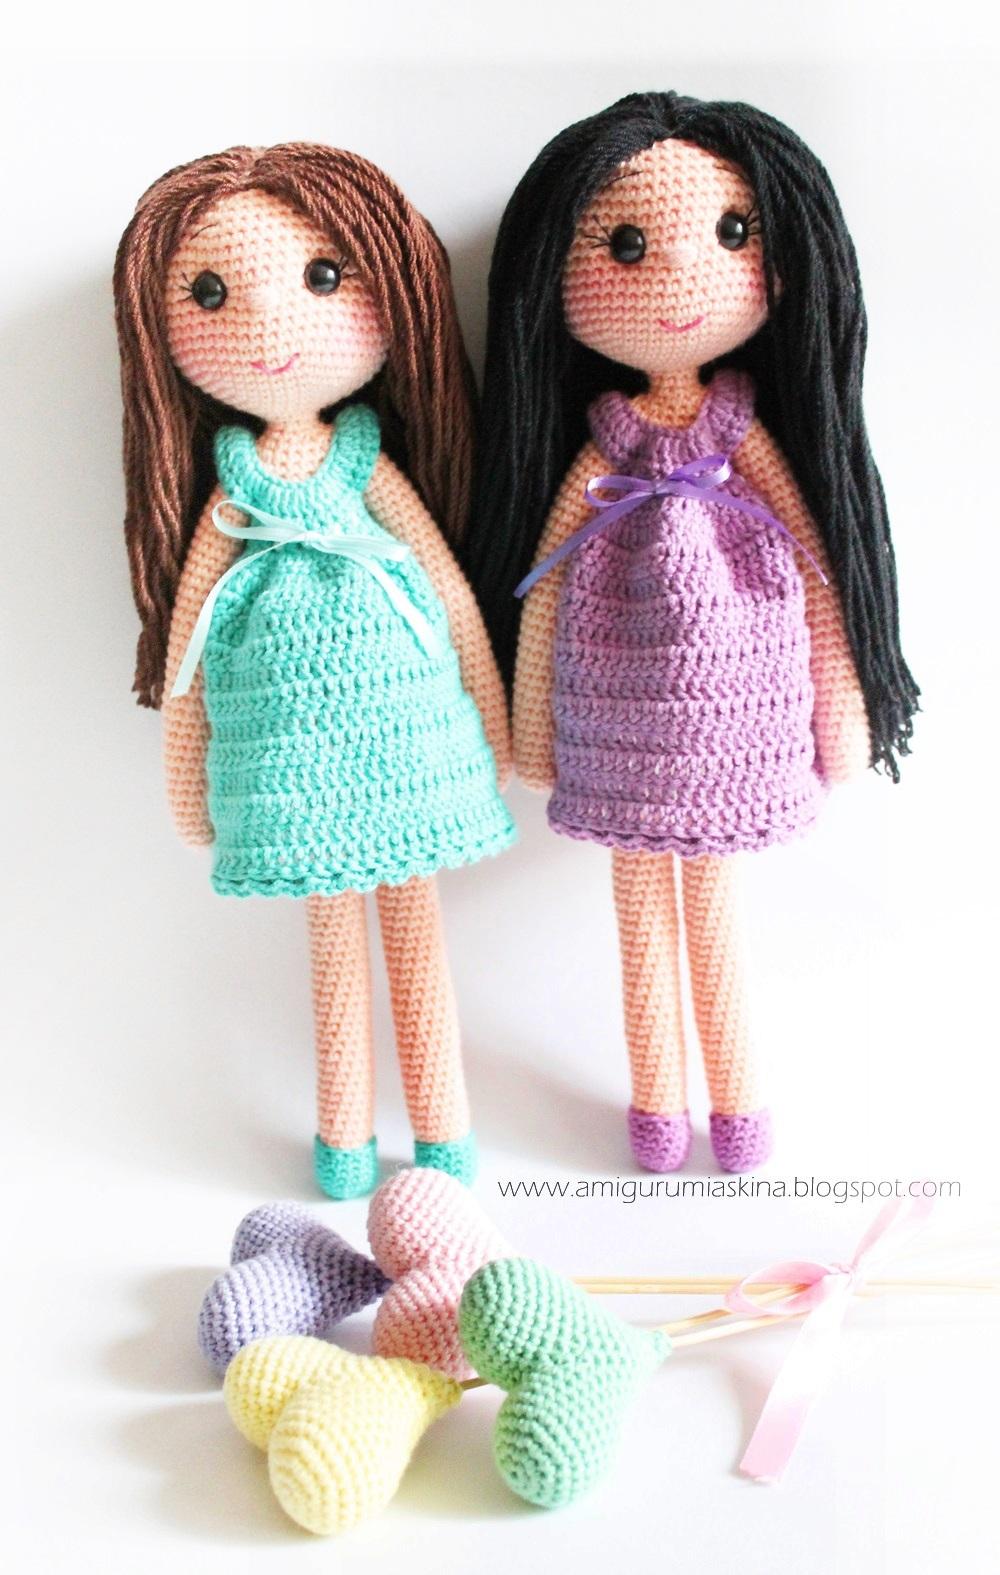 Niloya Amigurumi Free Pattern Doll Oyuncak Bebek : Amigurumi Abla-Karde? Bebekler-AmigurumiDoll Tiny Mini ...